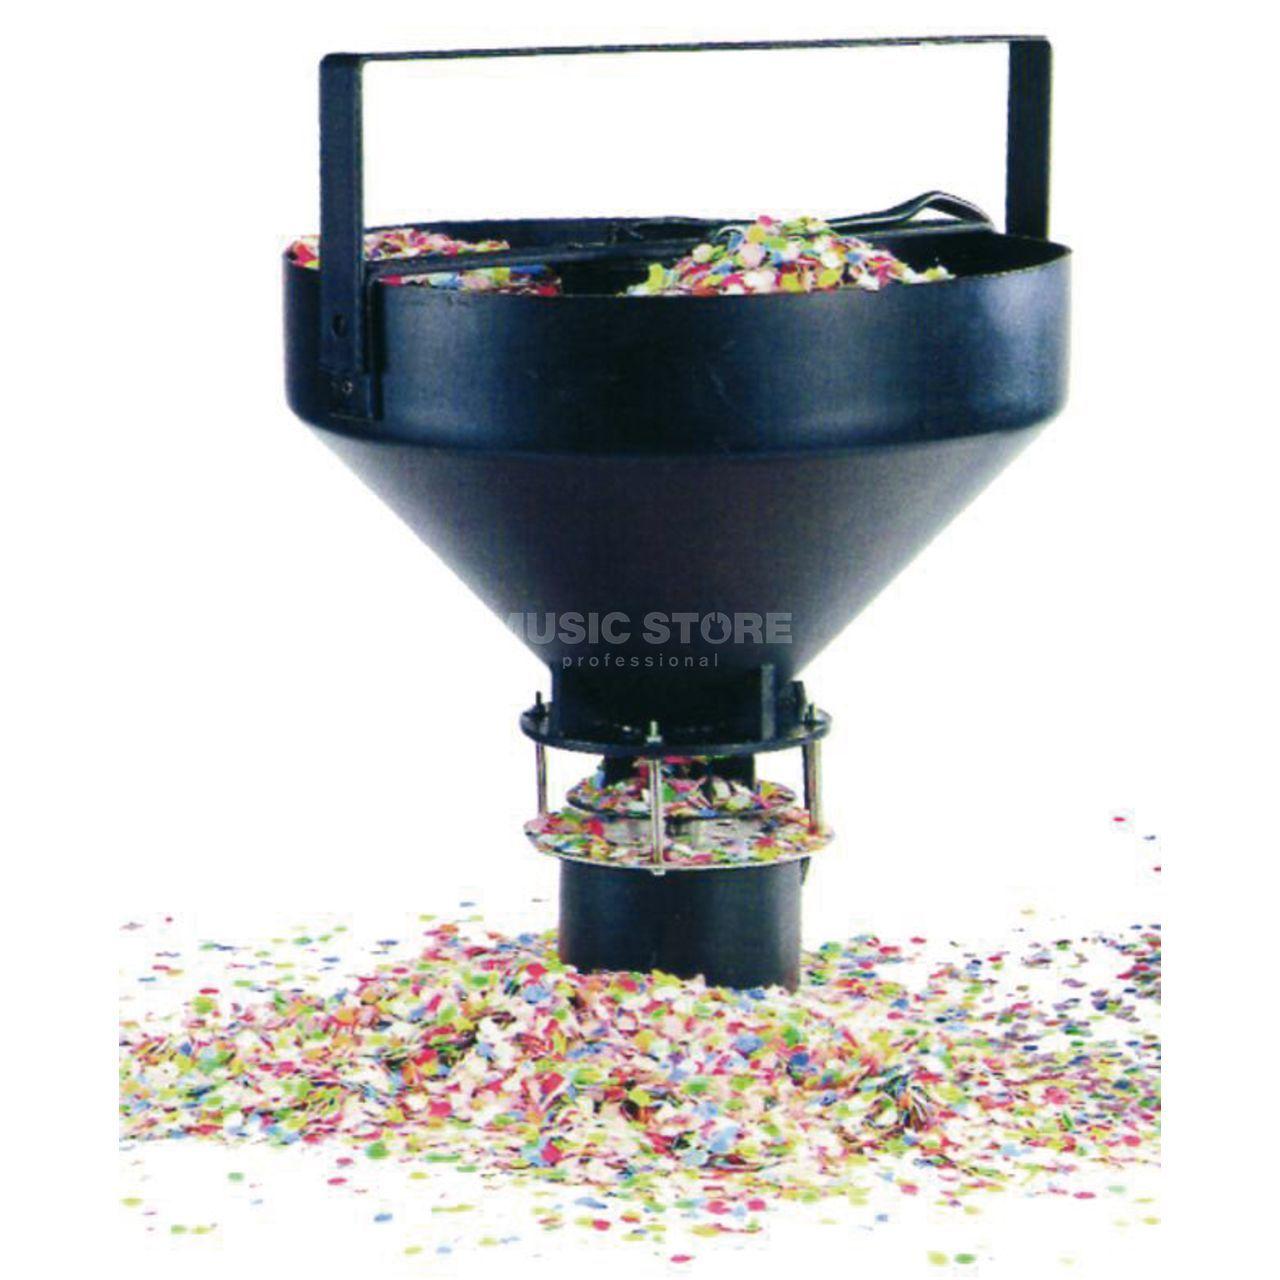 eurolite confetti machine. Black Bedroom Furniture Sets. Home Design Ideas